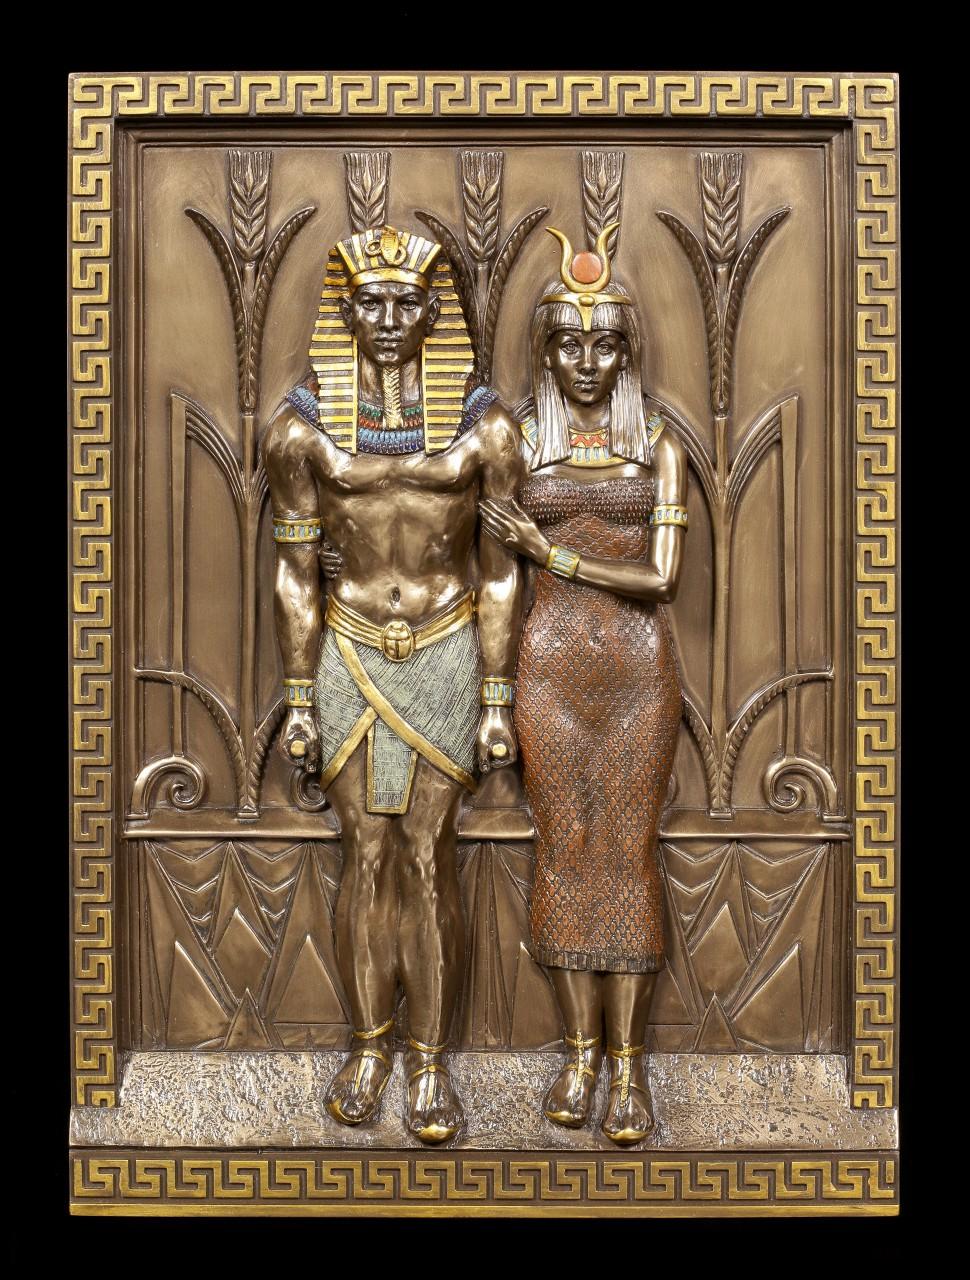 Ägyptisches Wandrelief - Pharao mit Königin